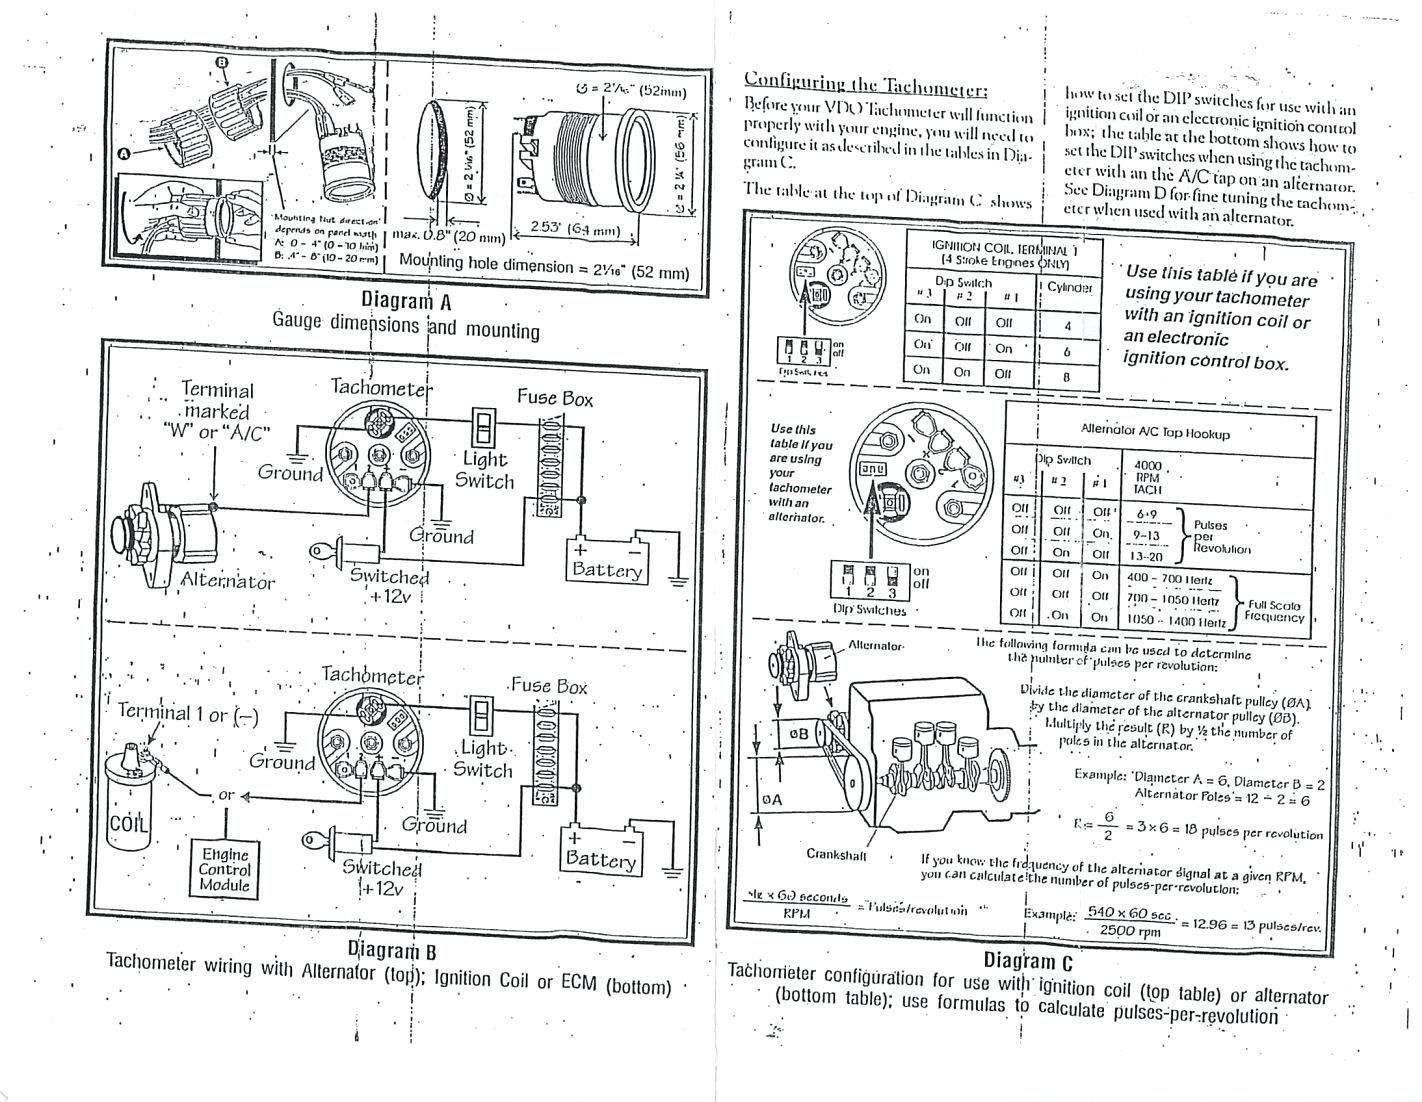 356 Tach Wiring | Wiring Diagram - Tachometer Wiring Diagram